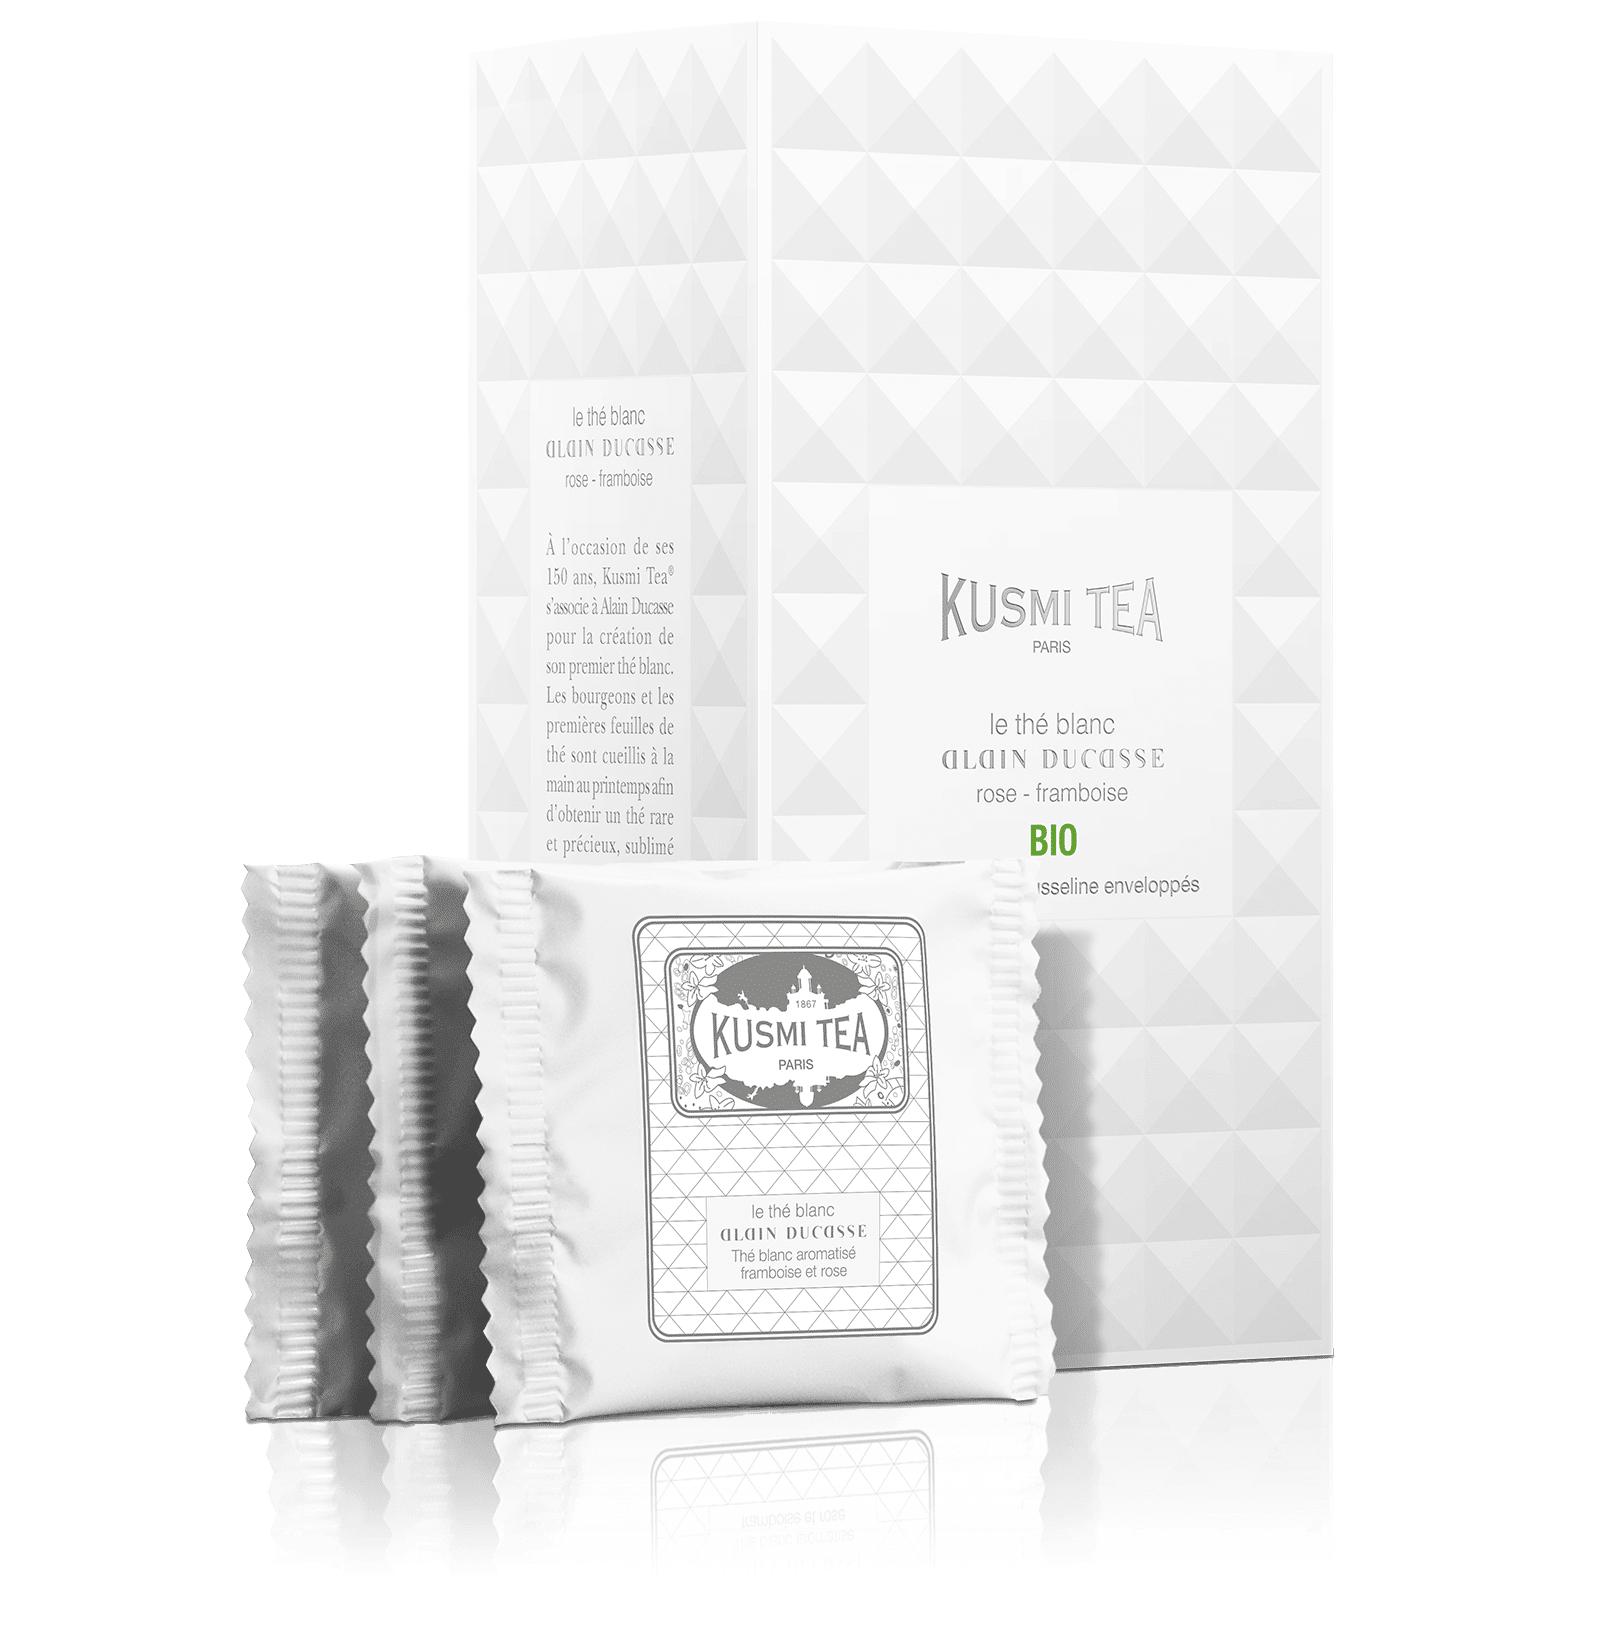 KUSMI TEA Le Thé Blanc Alain Ducasse Bio - Thé blanc aromatisé framboise et rose - Sachets de thé - Kusmi Tea